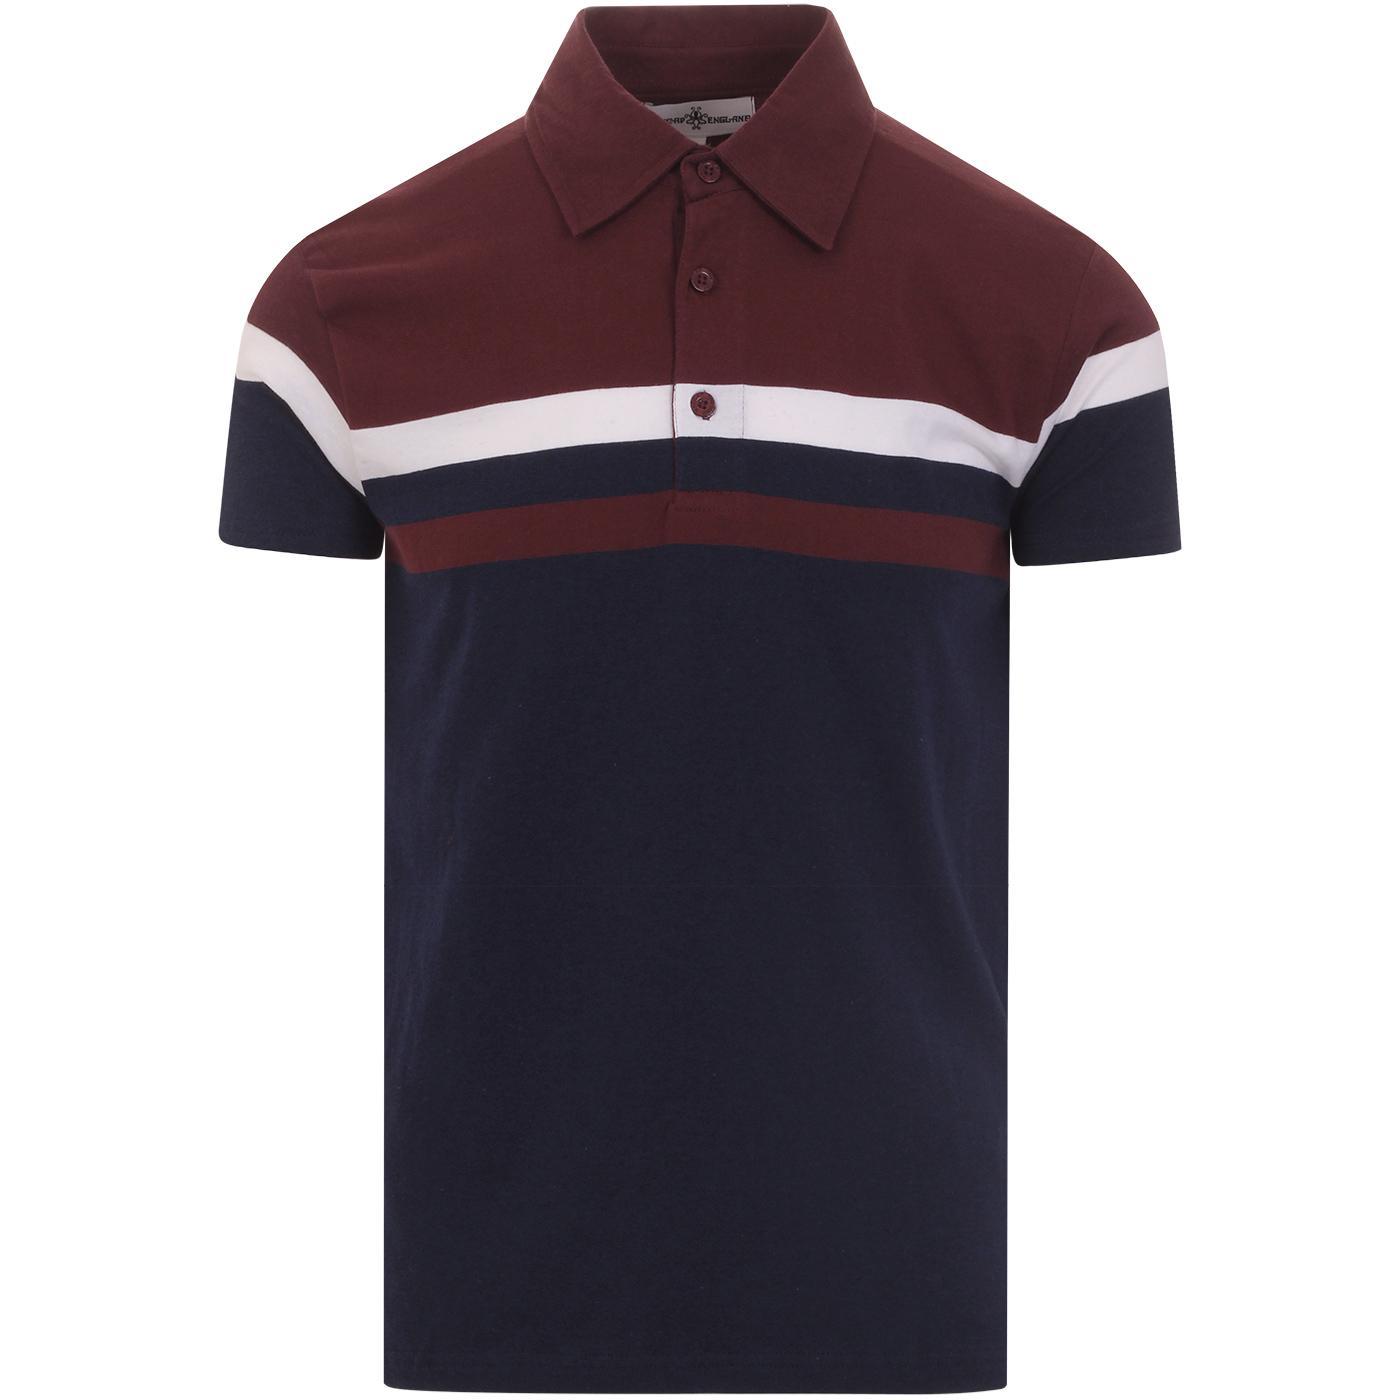 Jimmy The Gent MADCAP ENGLAND Mod Stripe Polo (P)